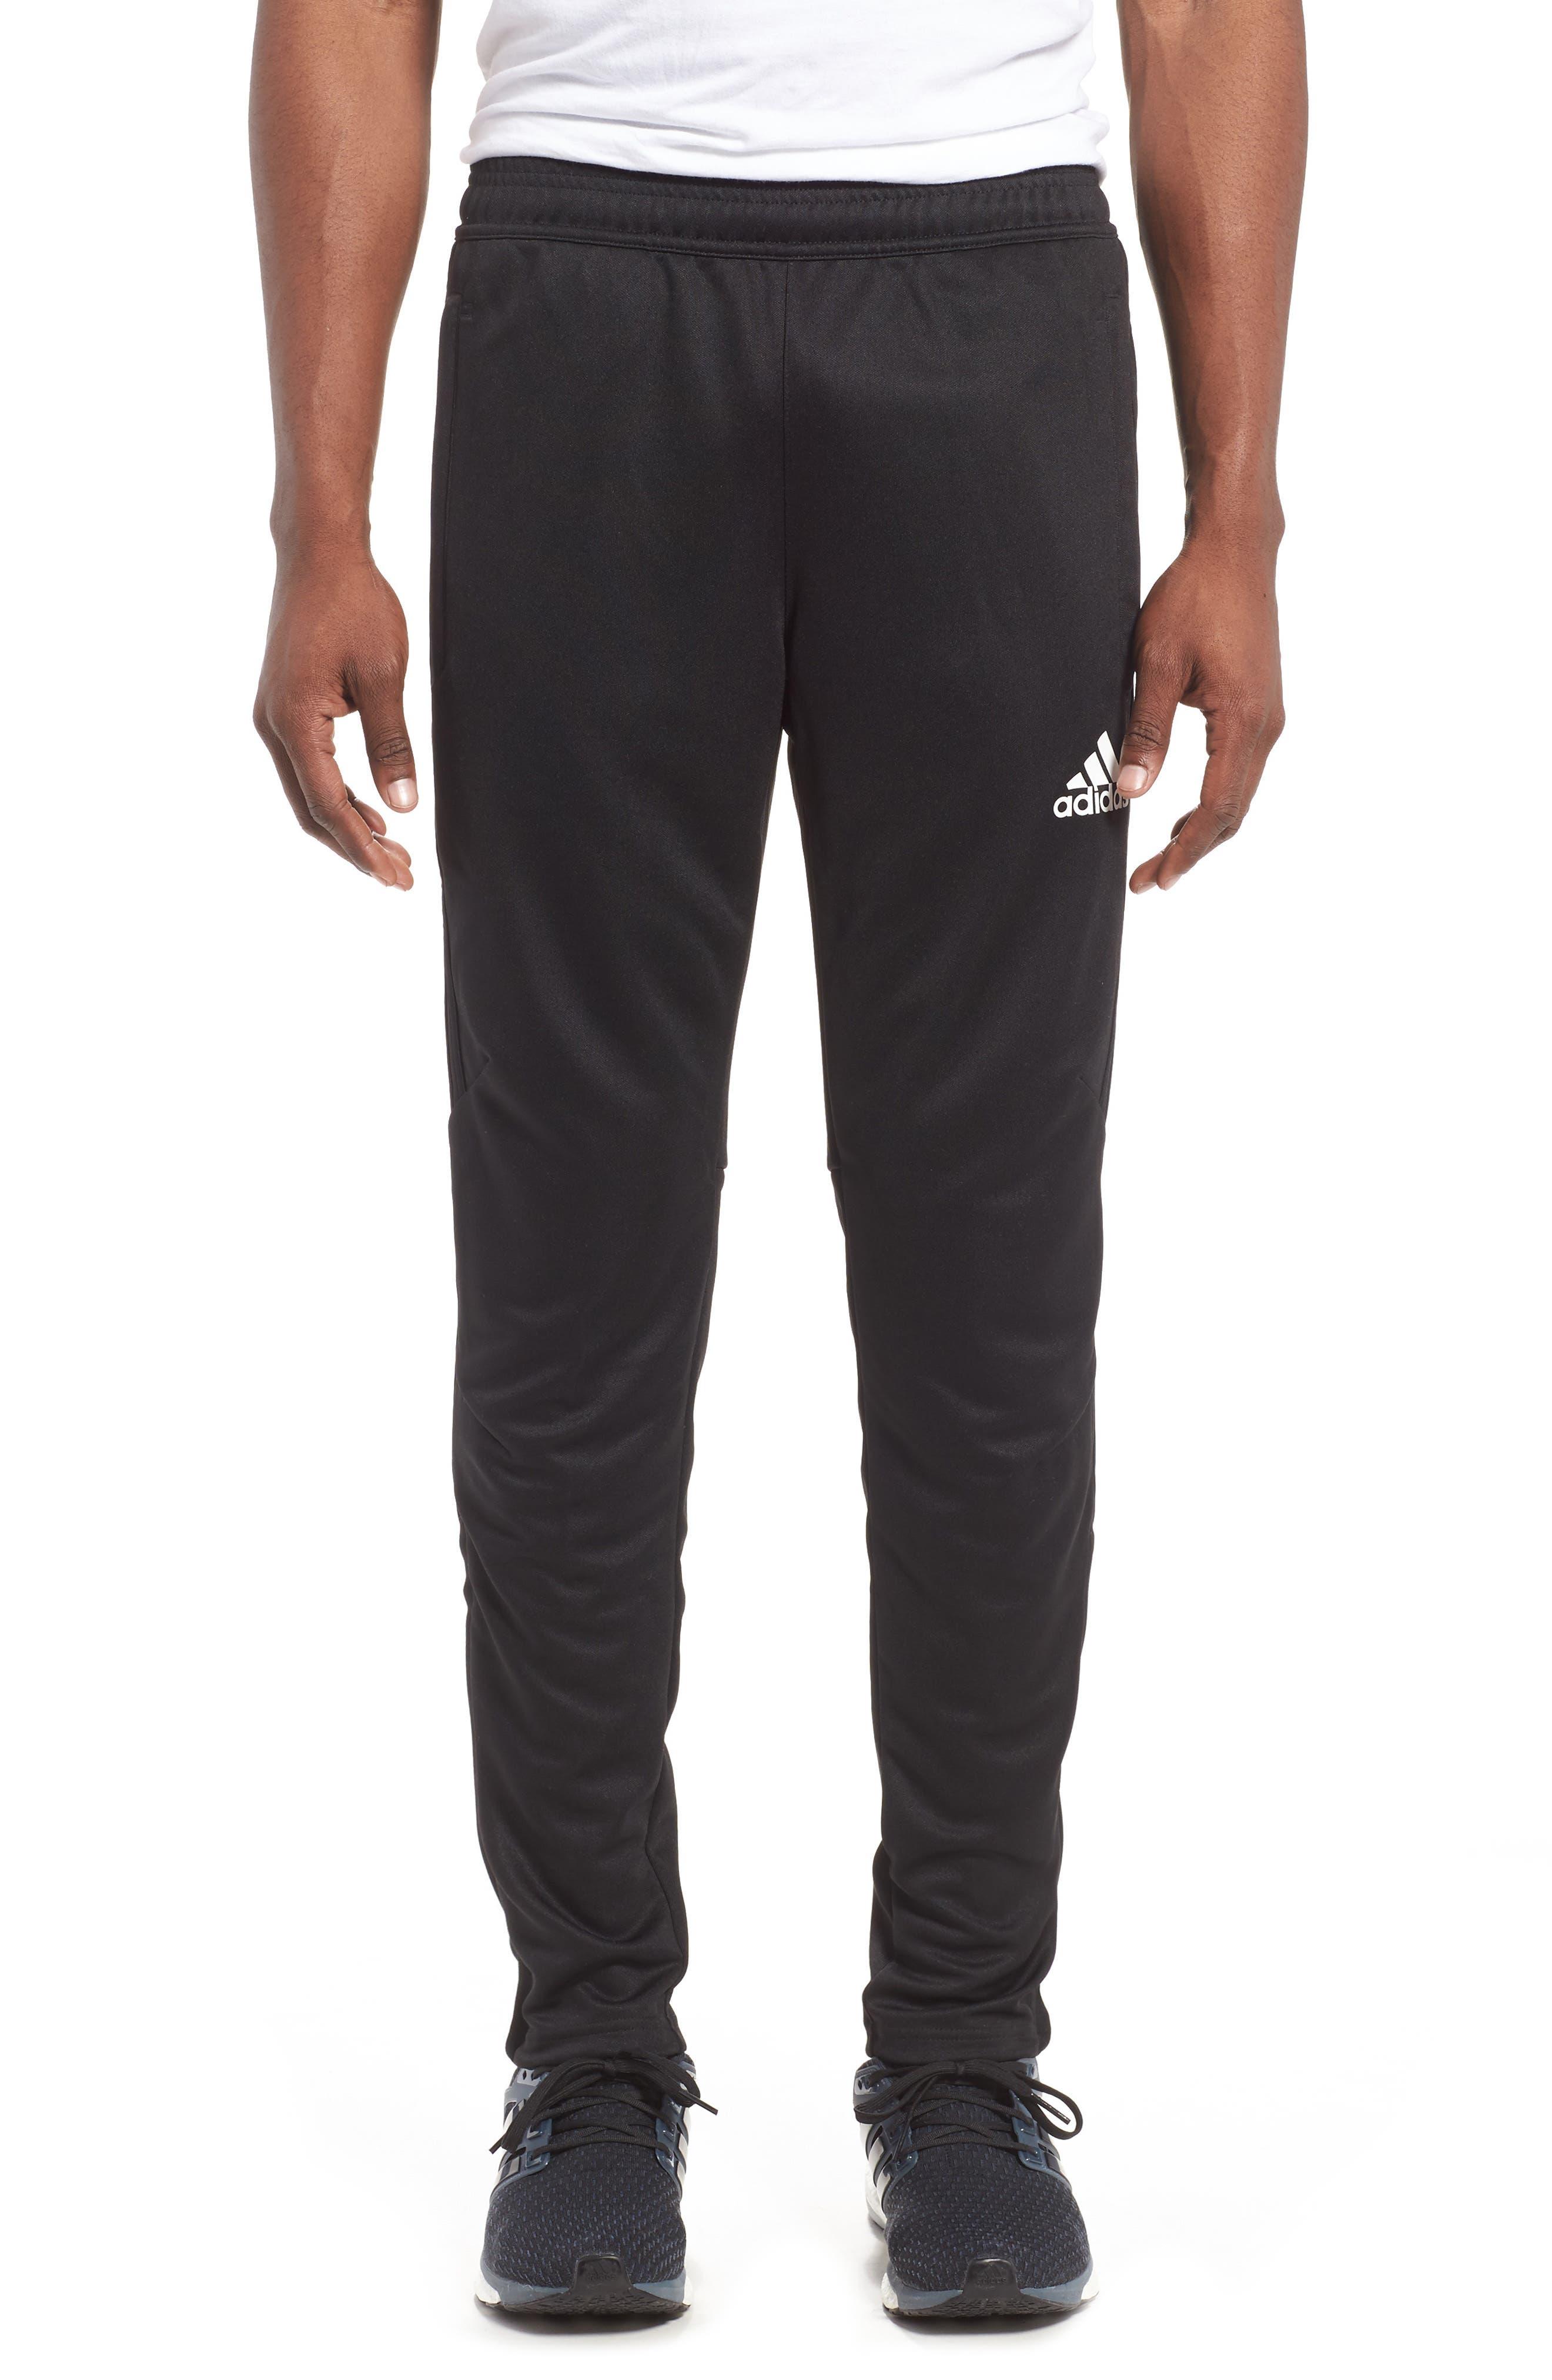 Alternate Image 1 Selected - adidas Tiro 17 Training Pants